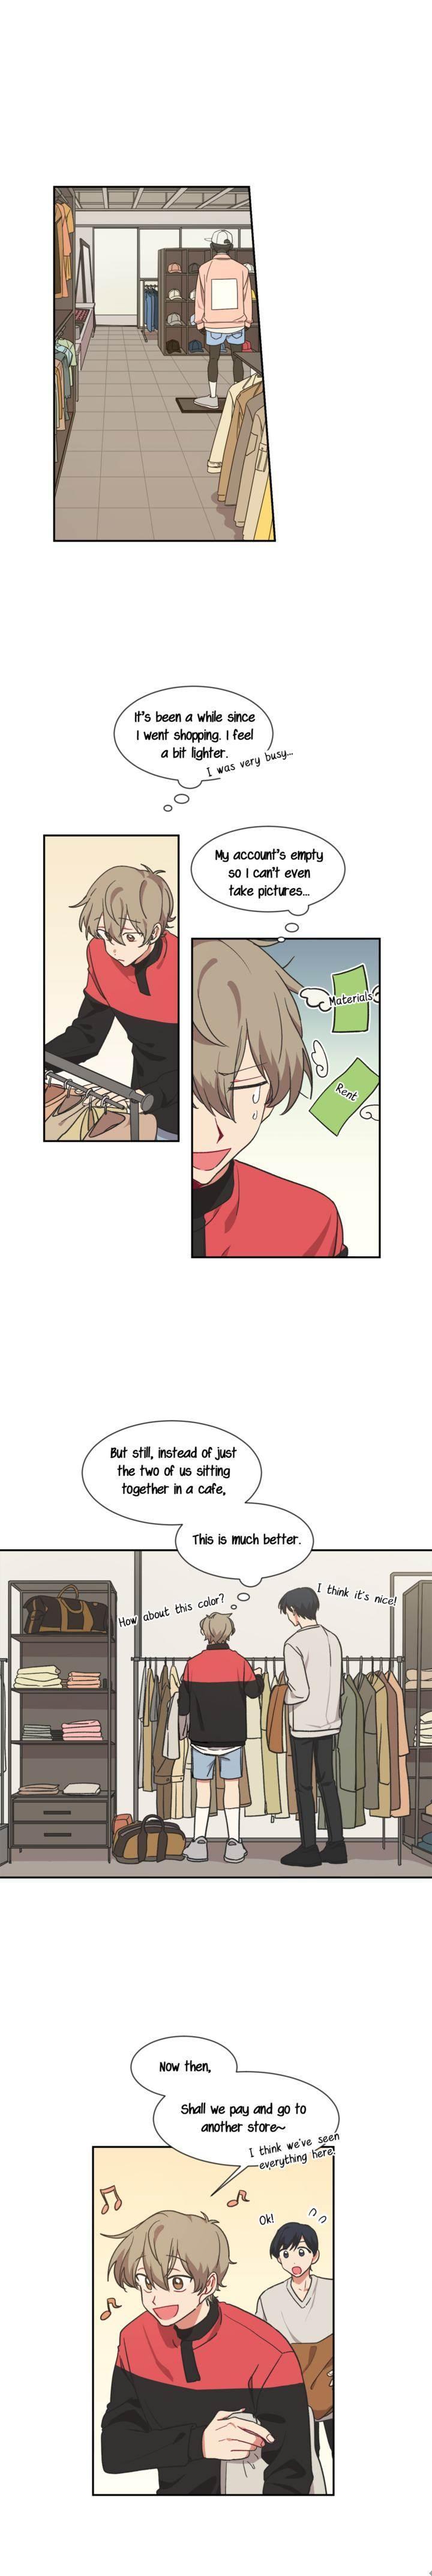 https://manga.mangadogs.com/comics/pic2/45/35437/1155769/cb2b01a7f6fb5da3ed42be4fcf80e4be.jpg Page 1